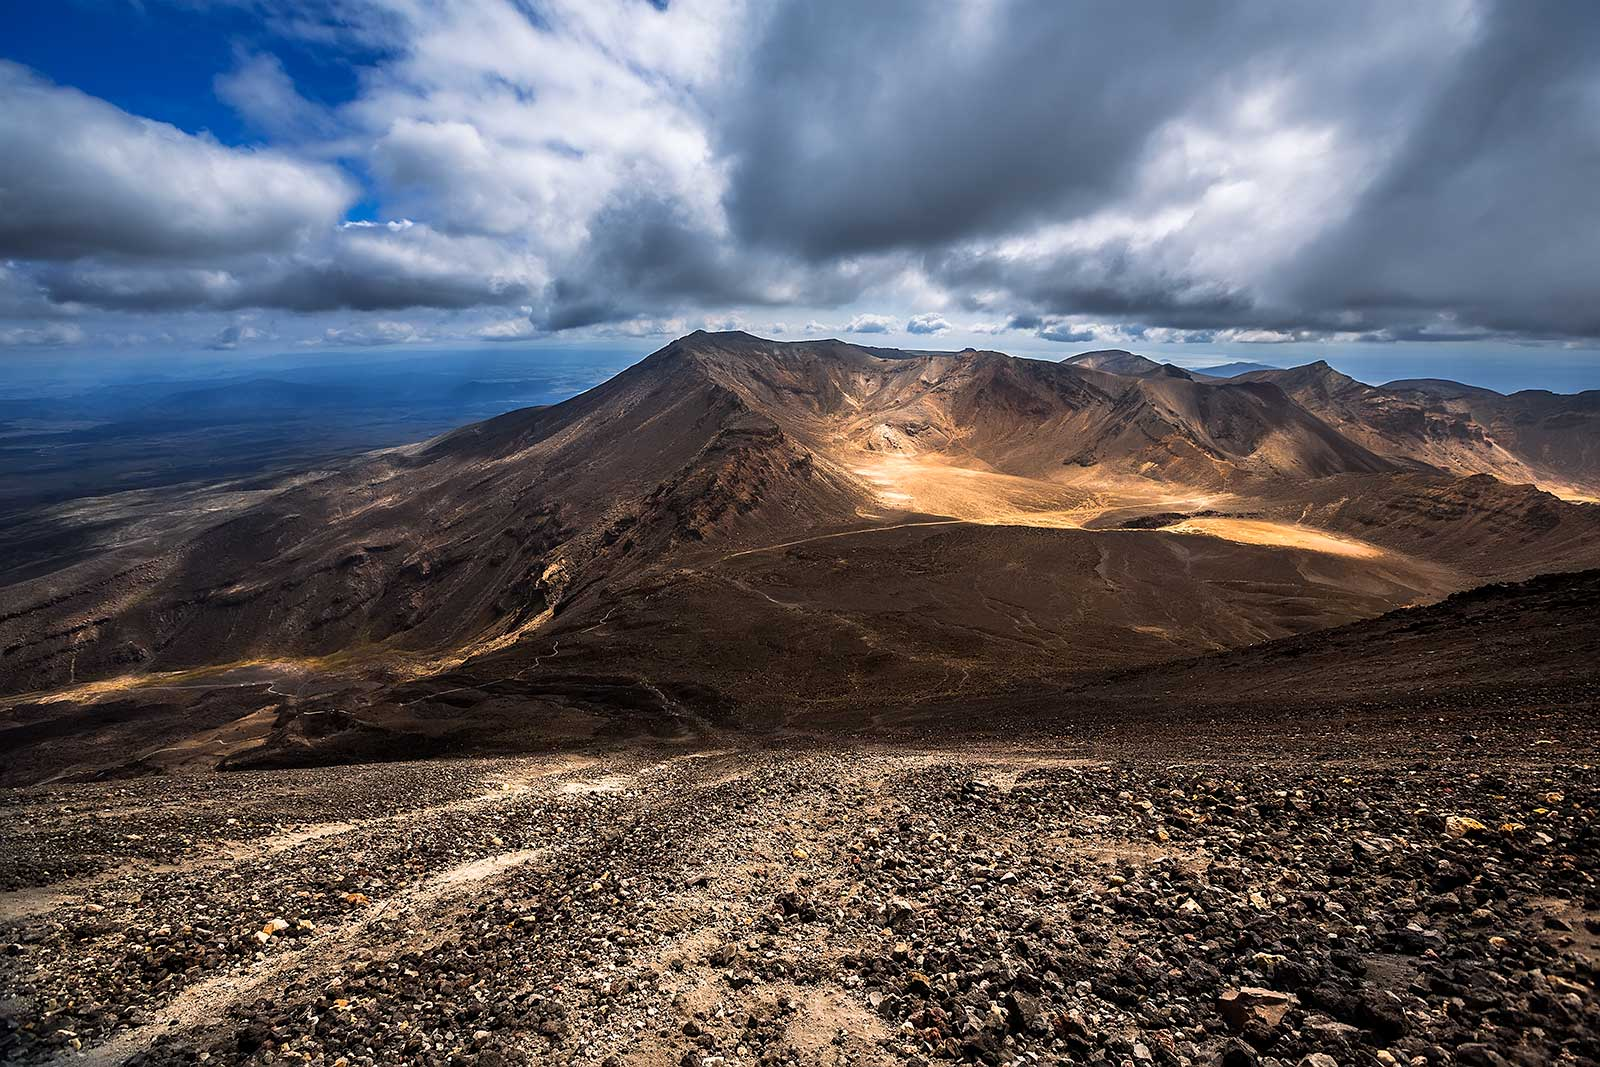 tongariro-alpine-crossing-view-from-mt-ngauruhoe-new-zealand